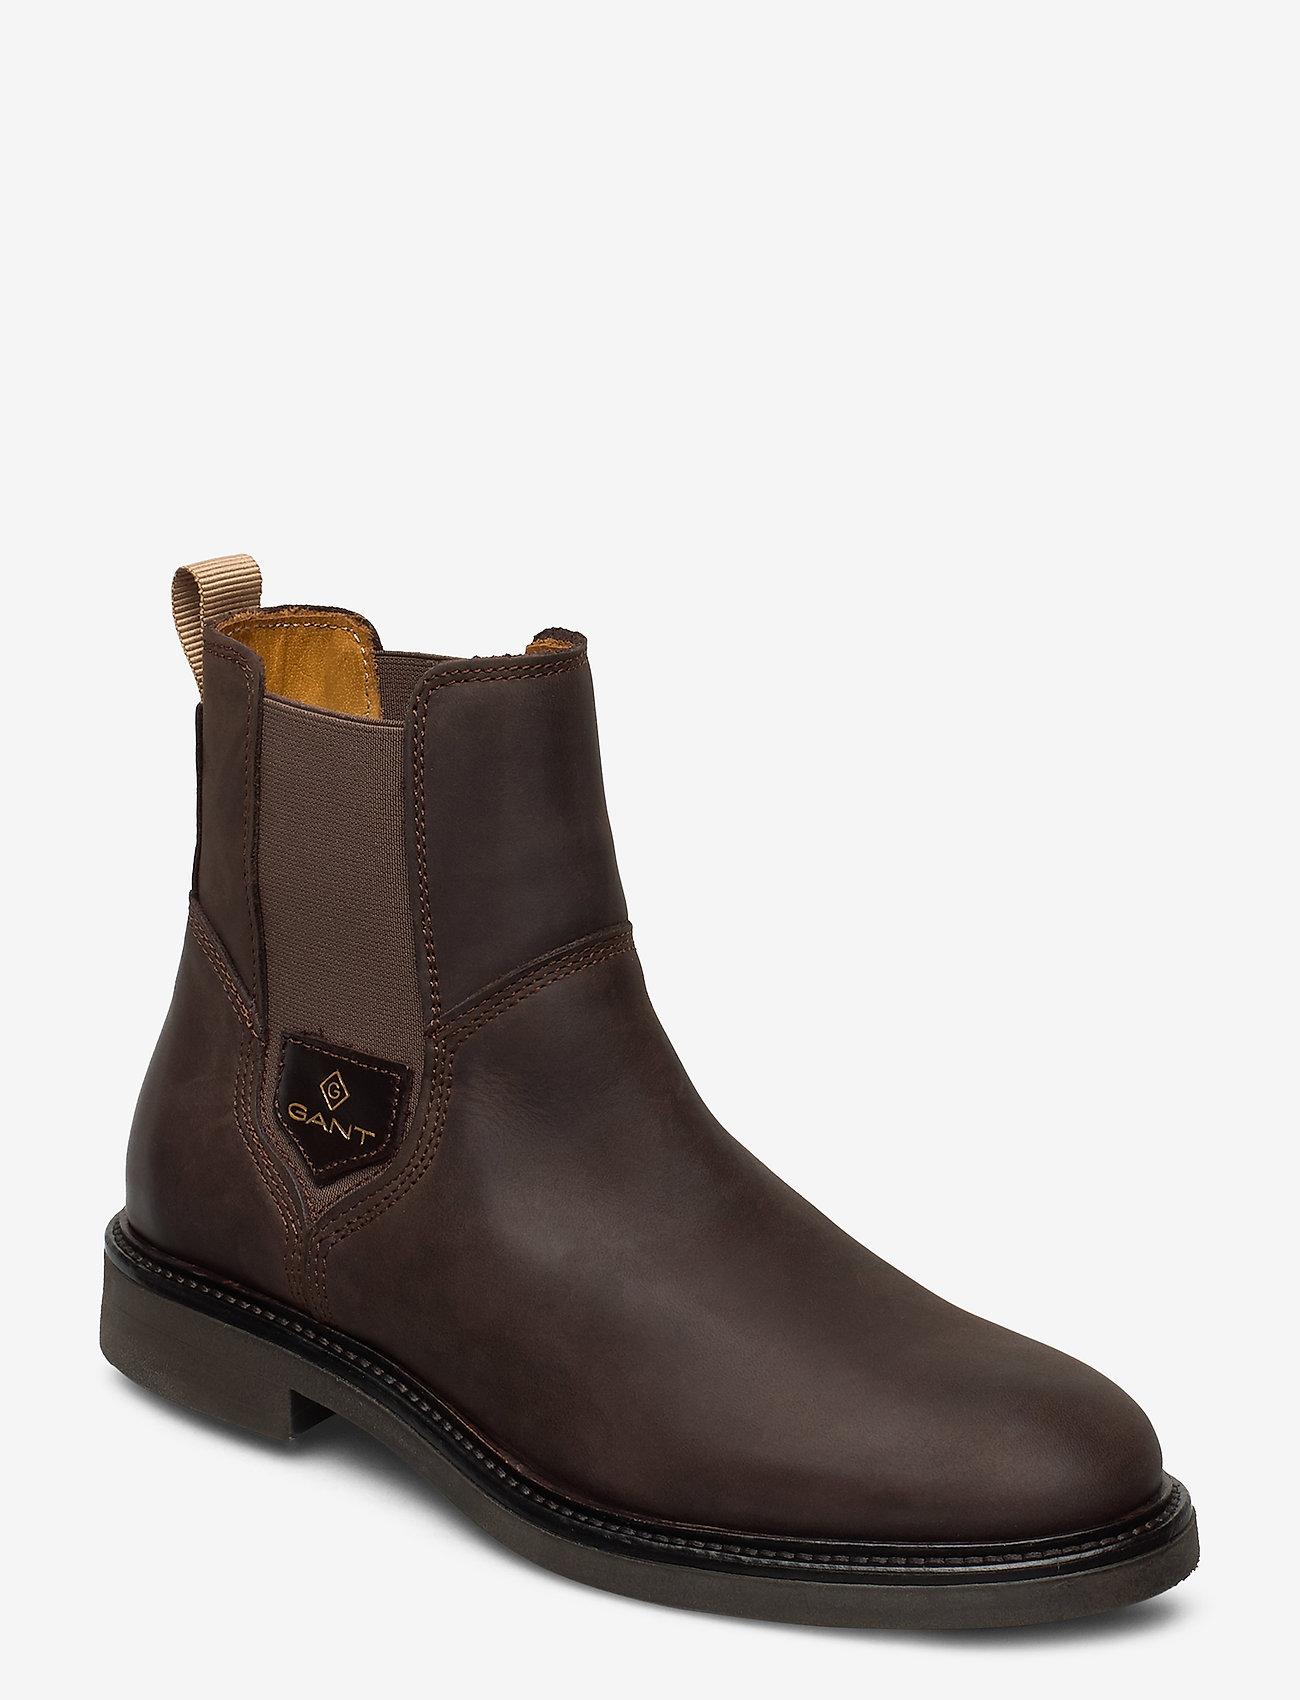 GANT - Ashleyy Chelsea - chelsea boots - dark brown - 0